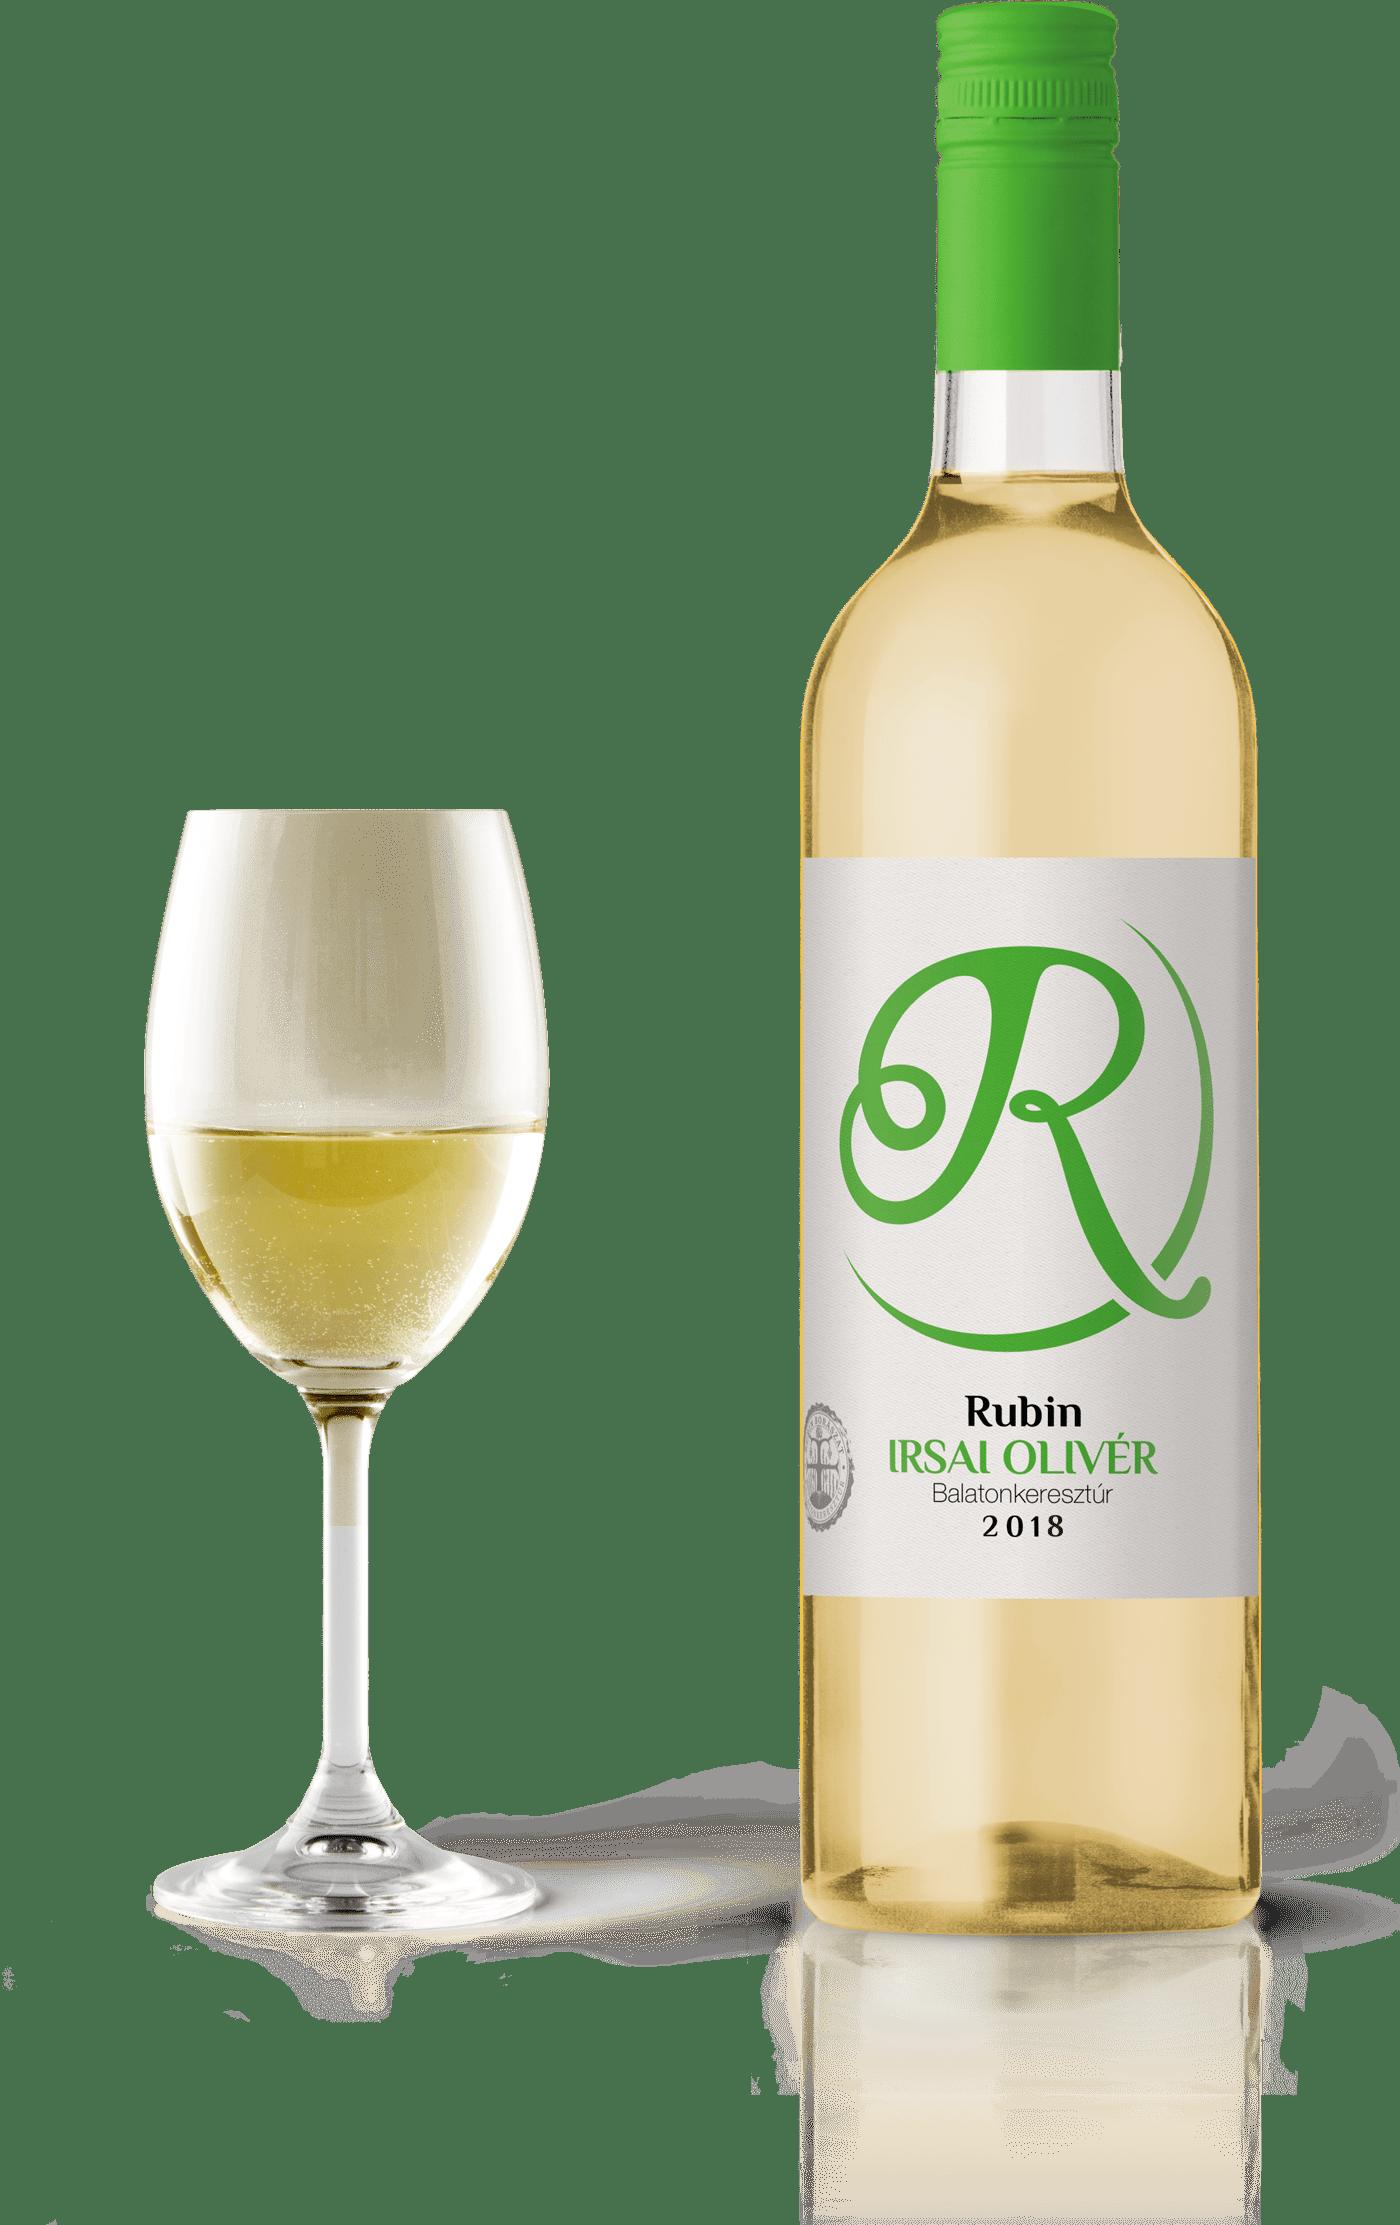 Rubin Borászat - 2018 - Irsai Olivér